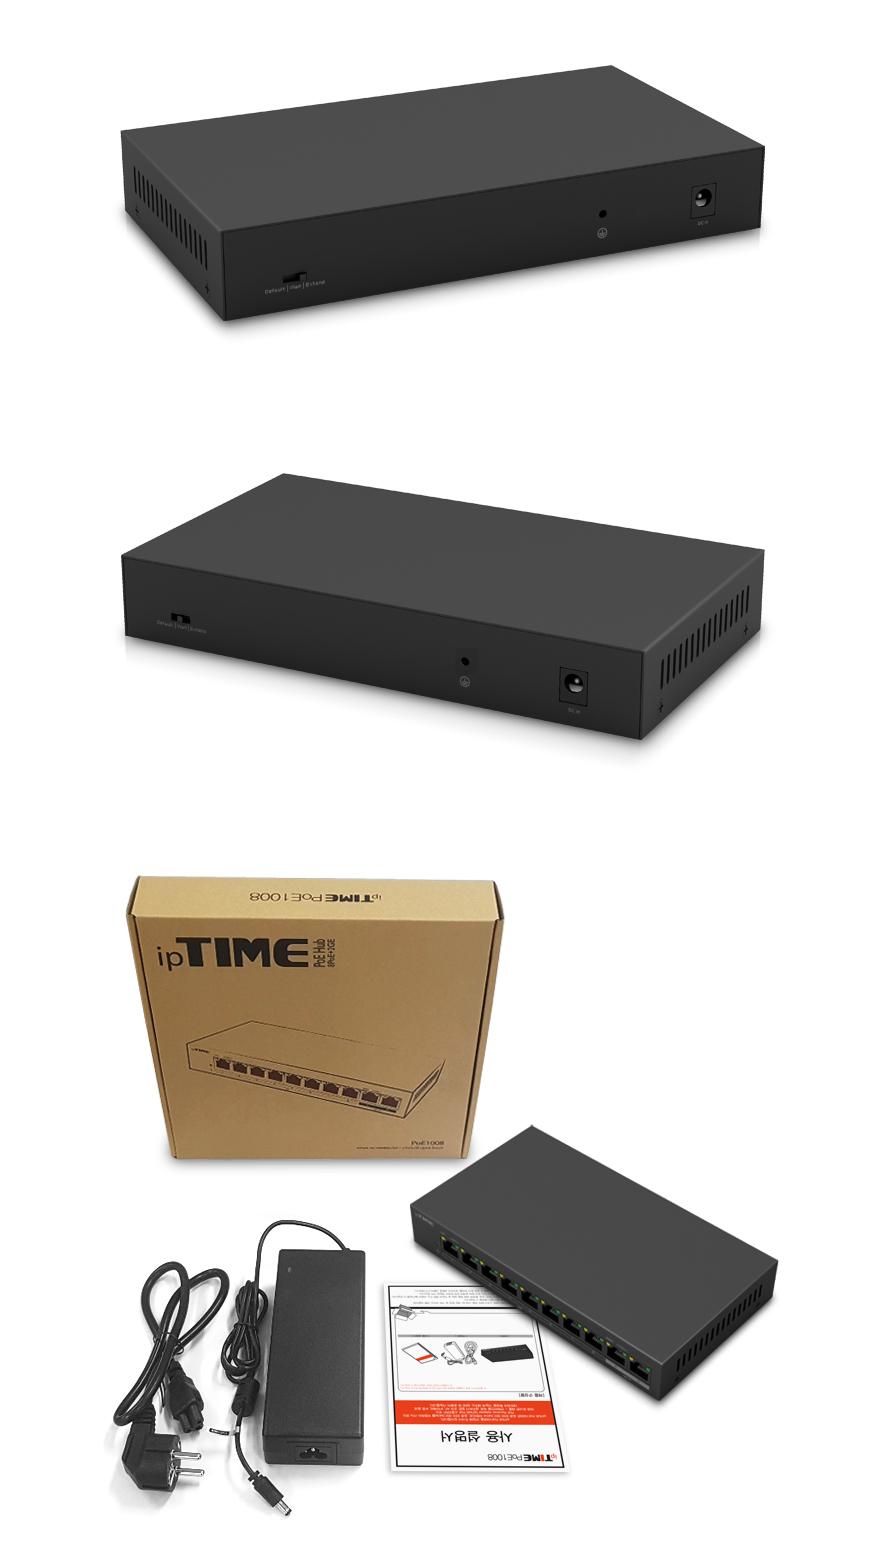 EFM ipTIME PoE1008 스위치허브